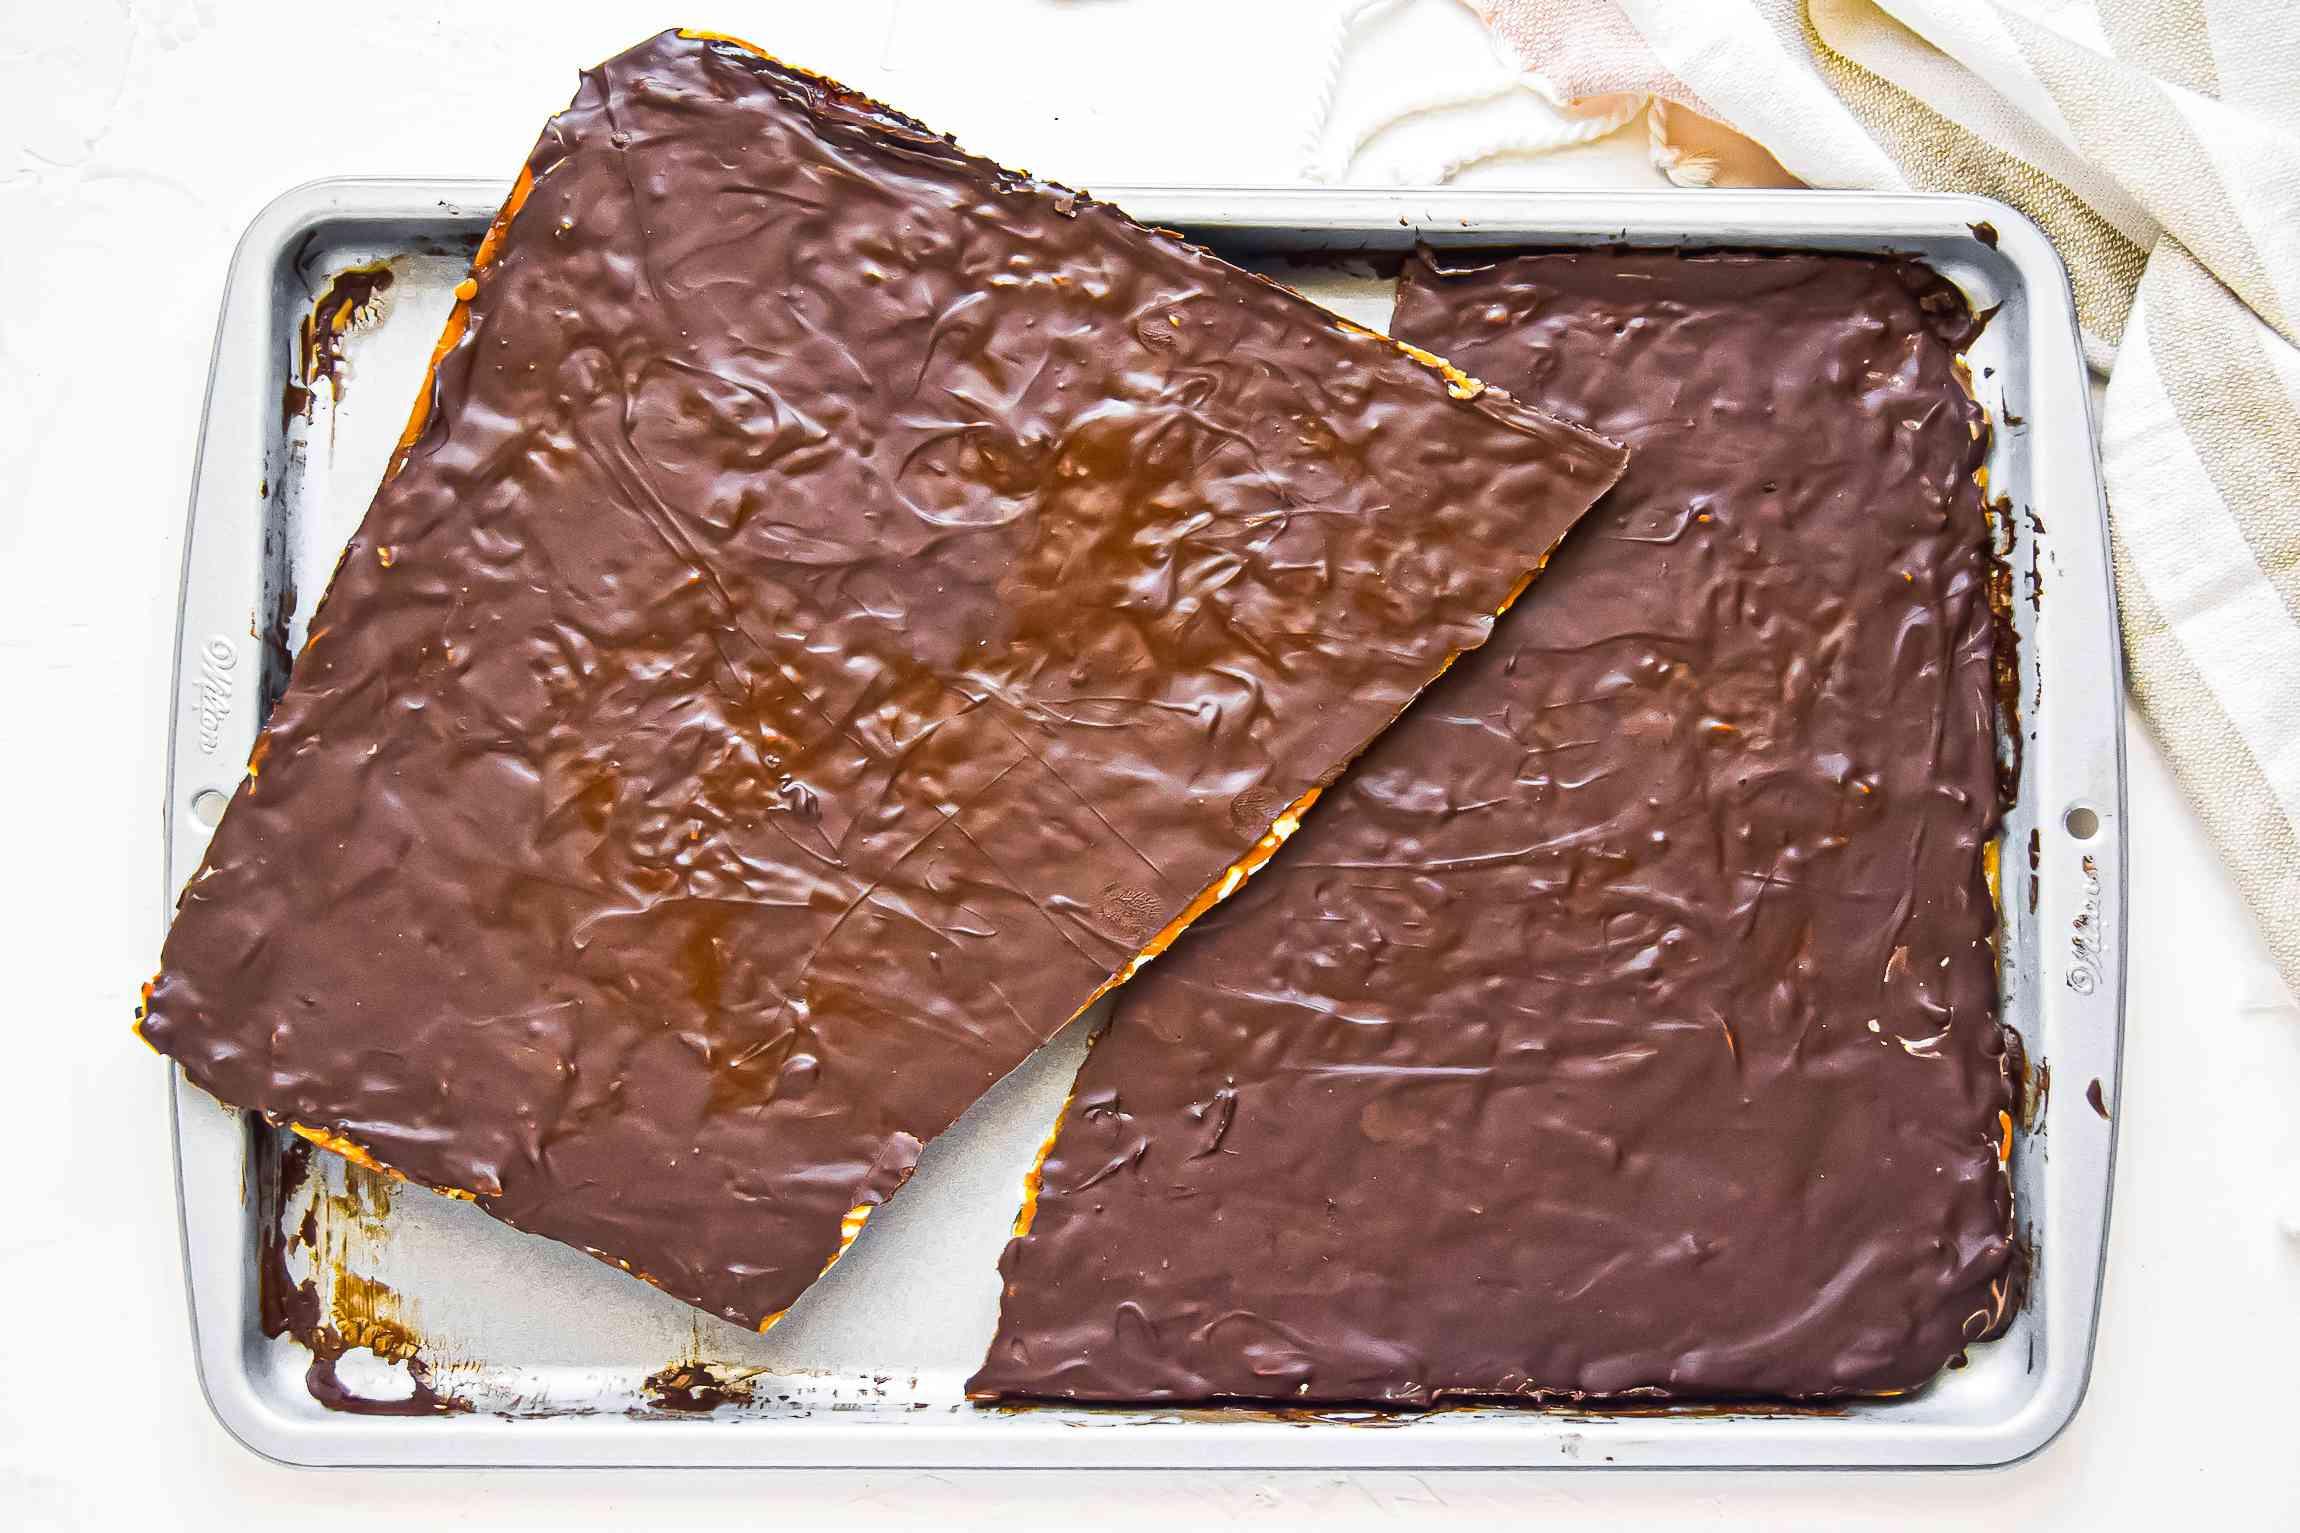 A large sheet of almond roca split in half on top a baking sheet.